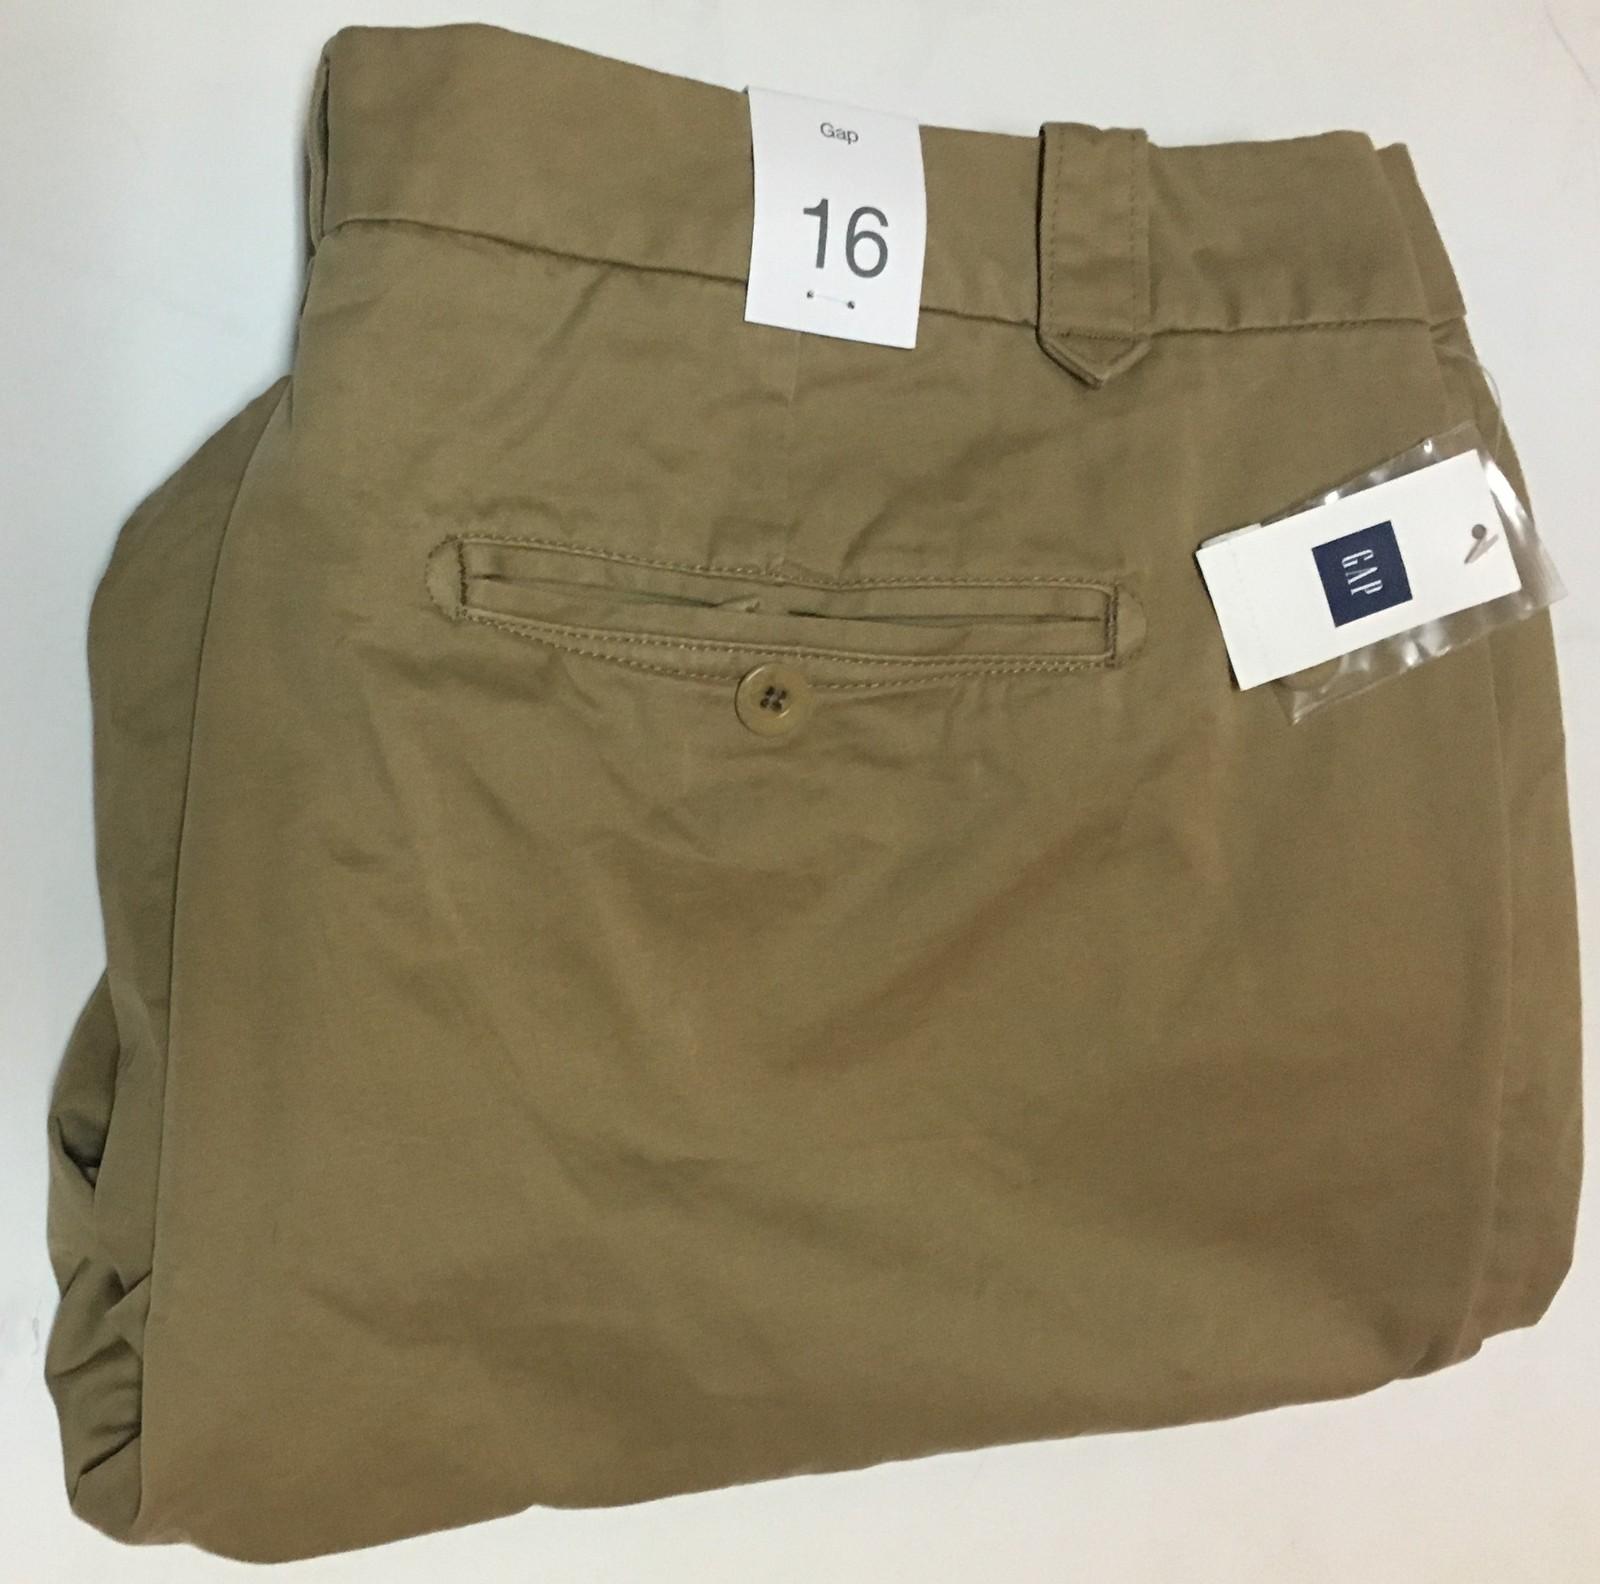 GAP Women's Cargo Beige Pants Khakis Chinos Sz 16 NWT